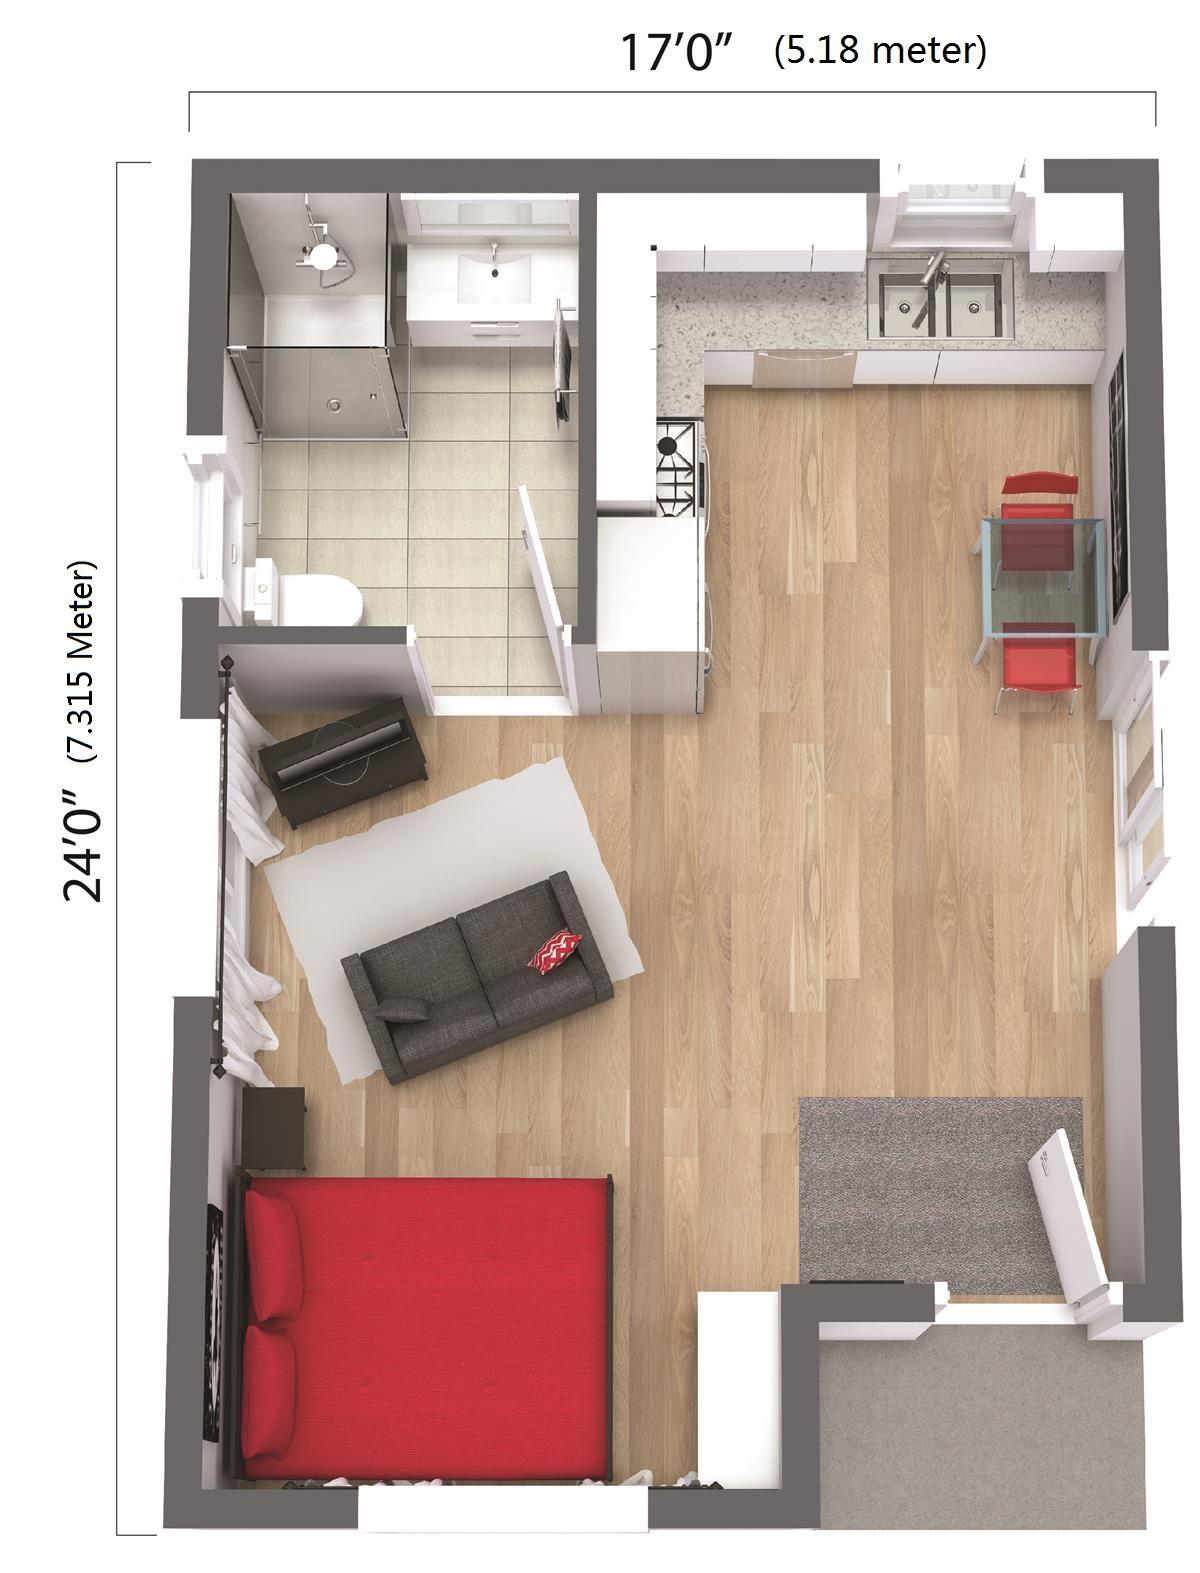 Rooms: Cheap Cement Foam House